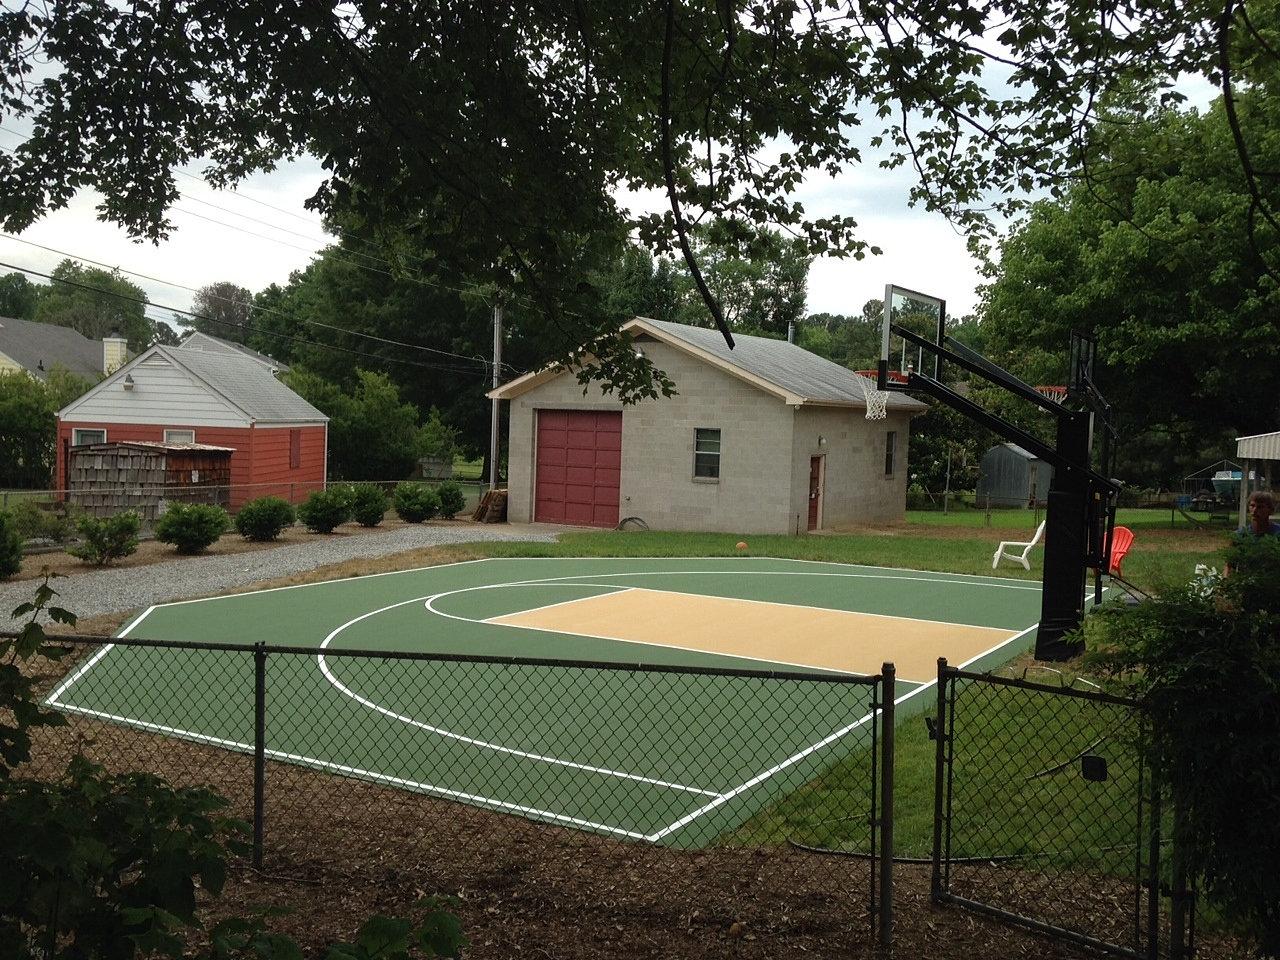 tennis court repair and resurfacing west end backyard basketball